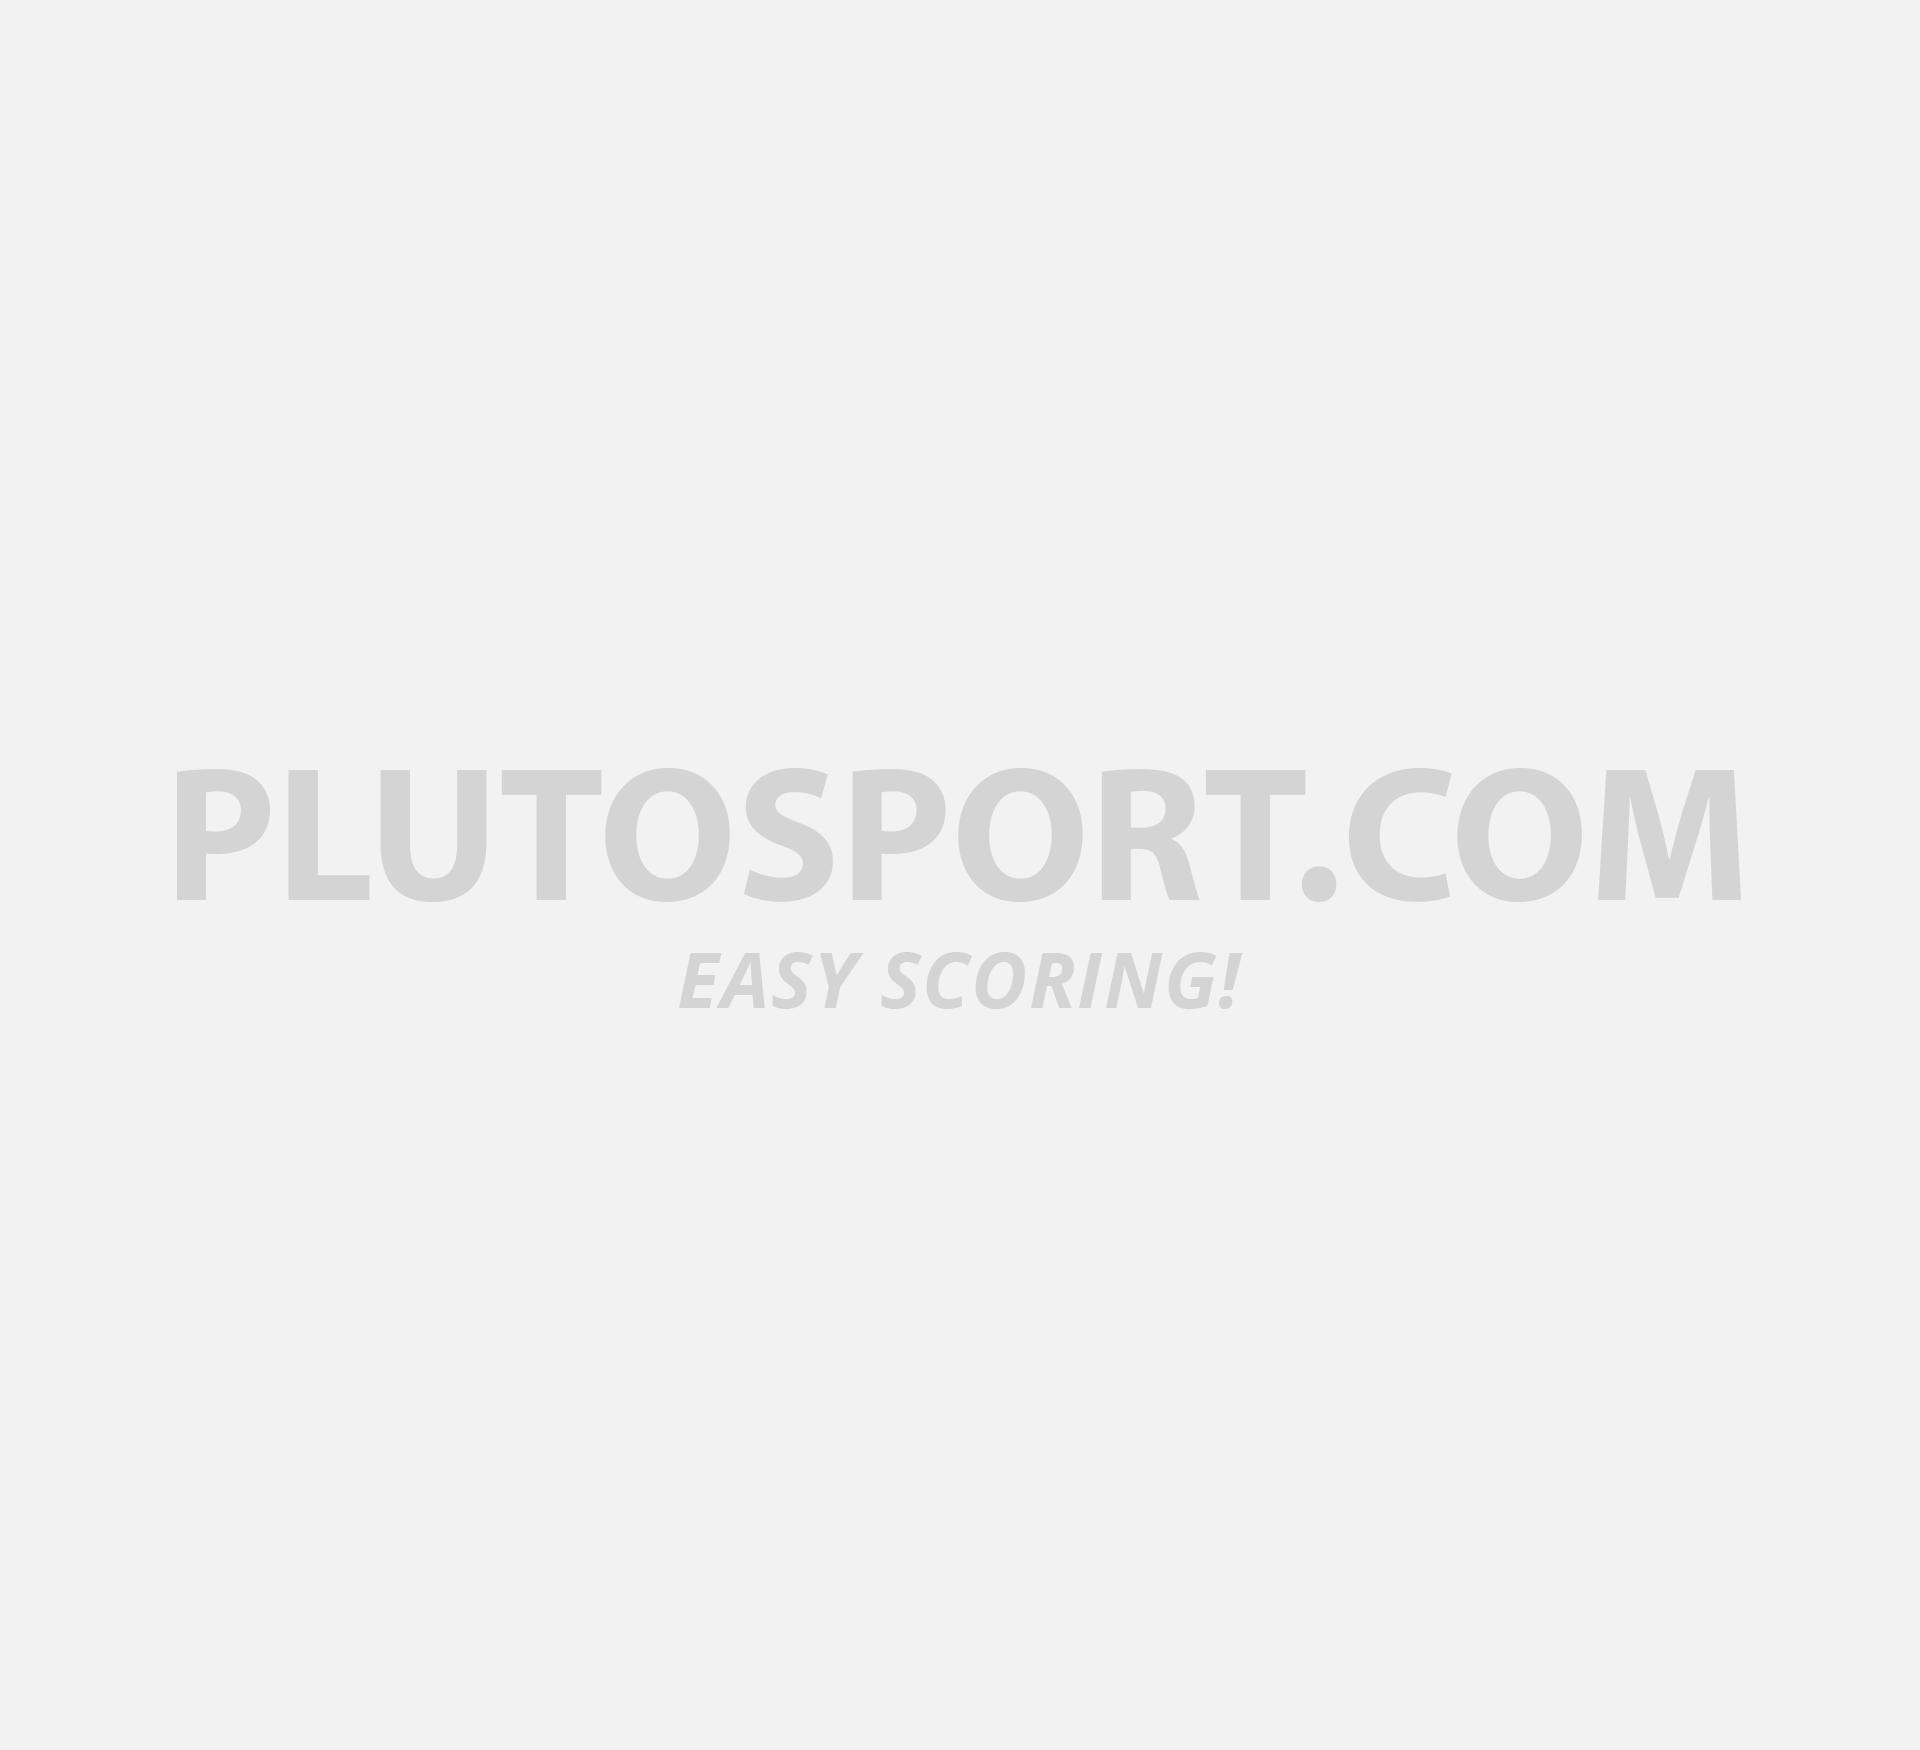 WattSUP Espadon 11' SUP Board Set